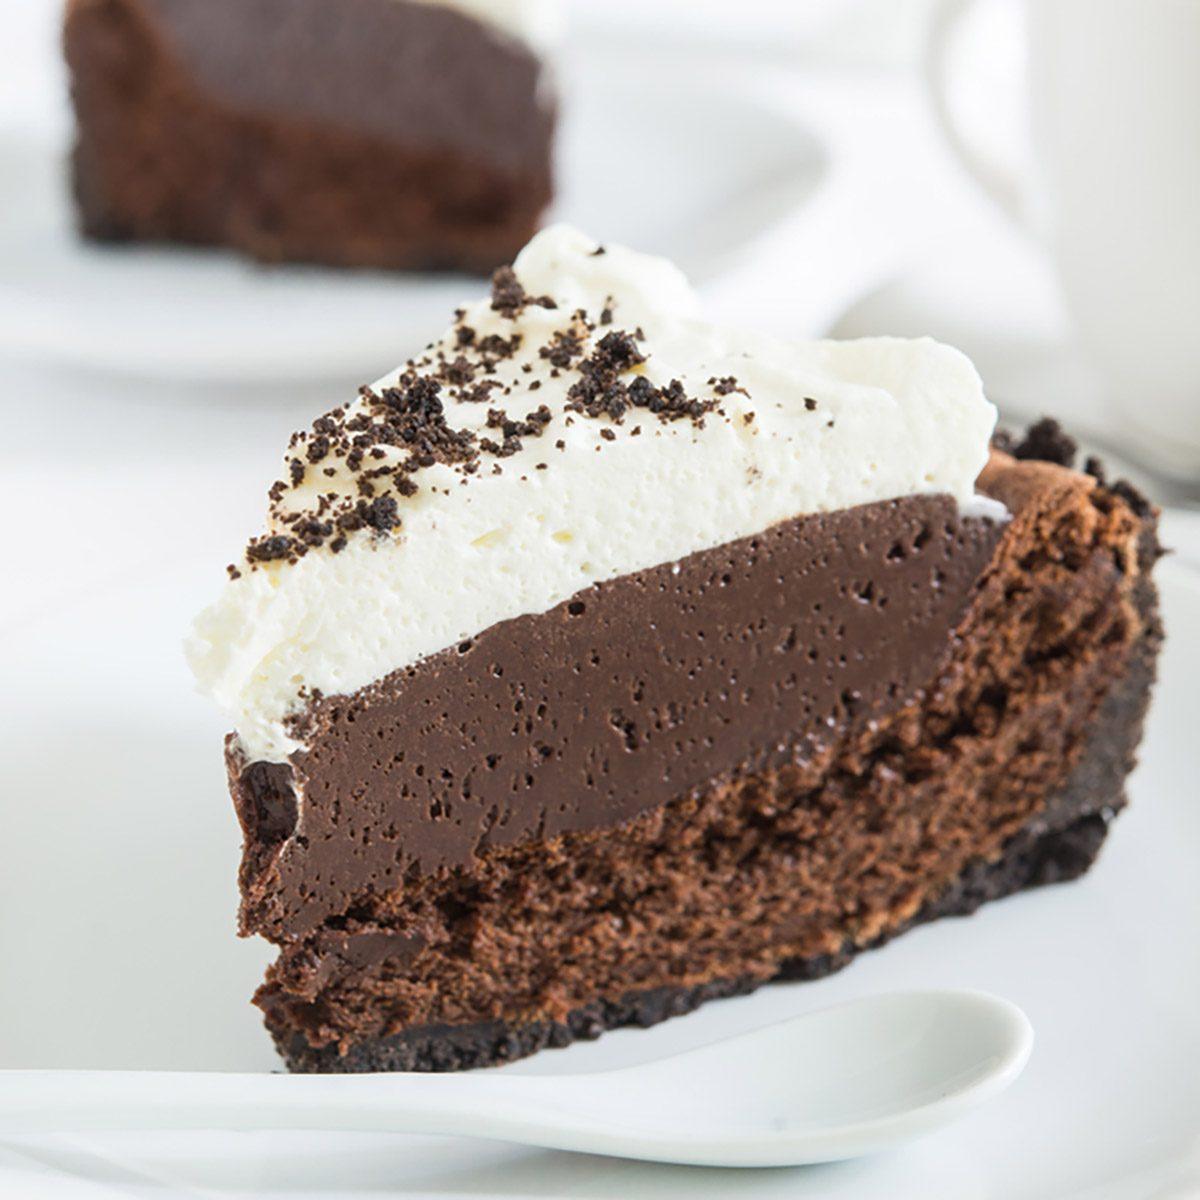 Mississippi mud pie (chocolate cake)